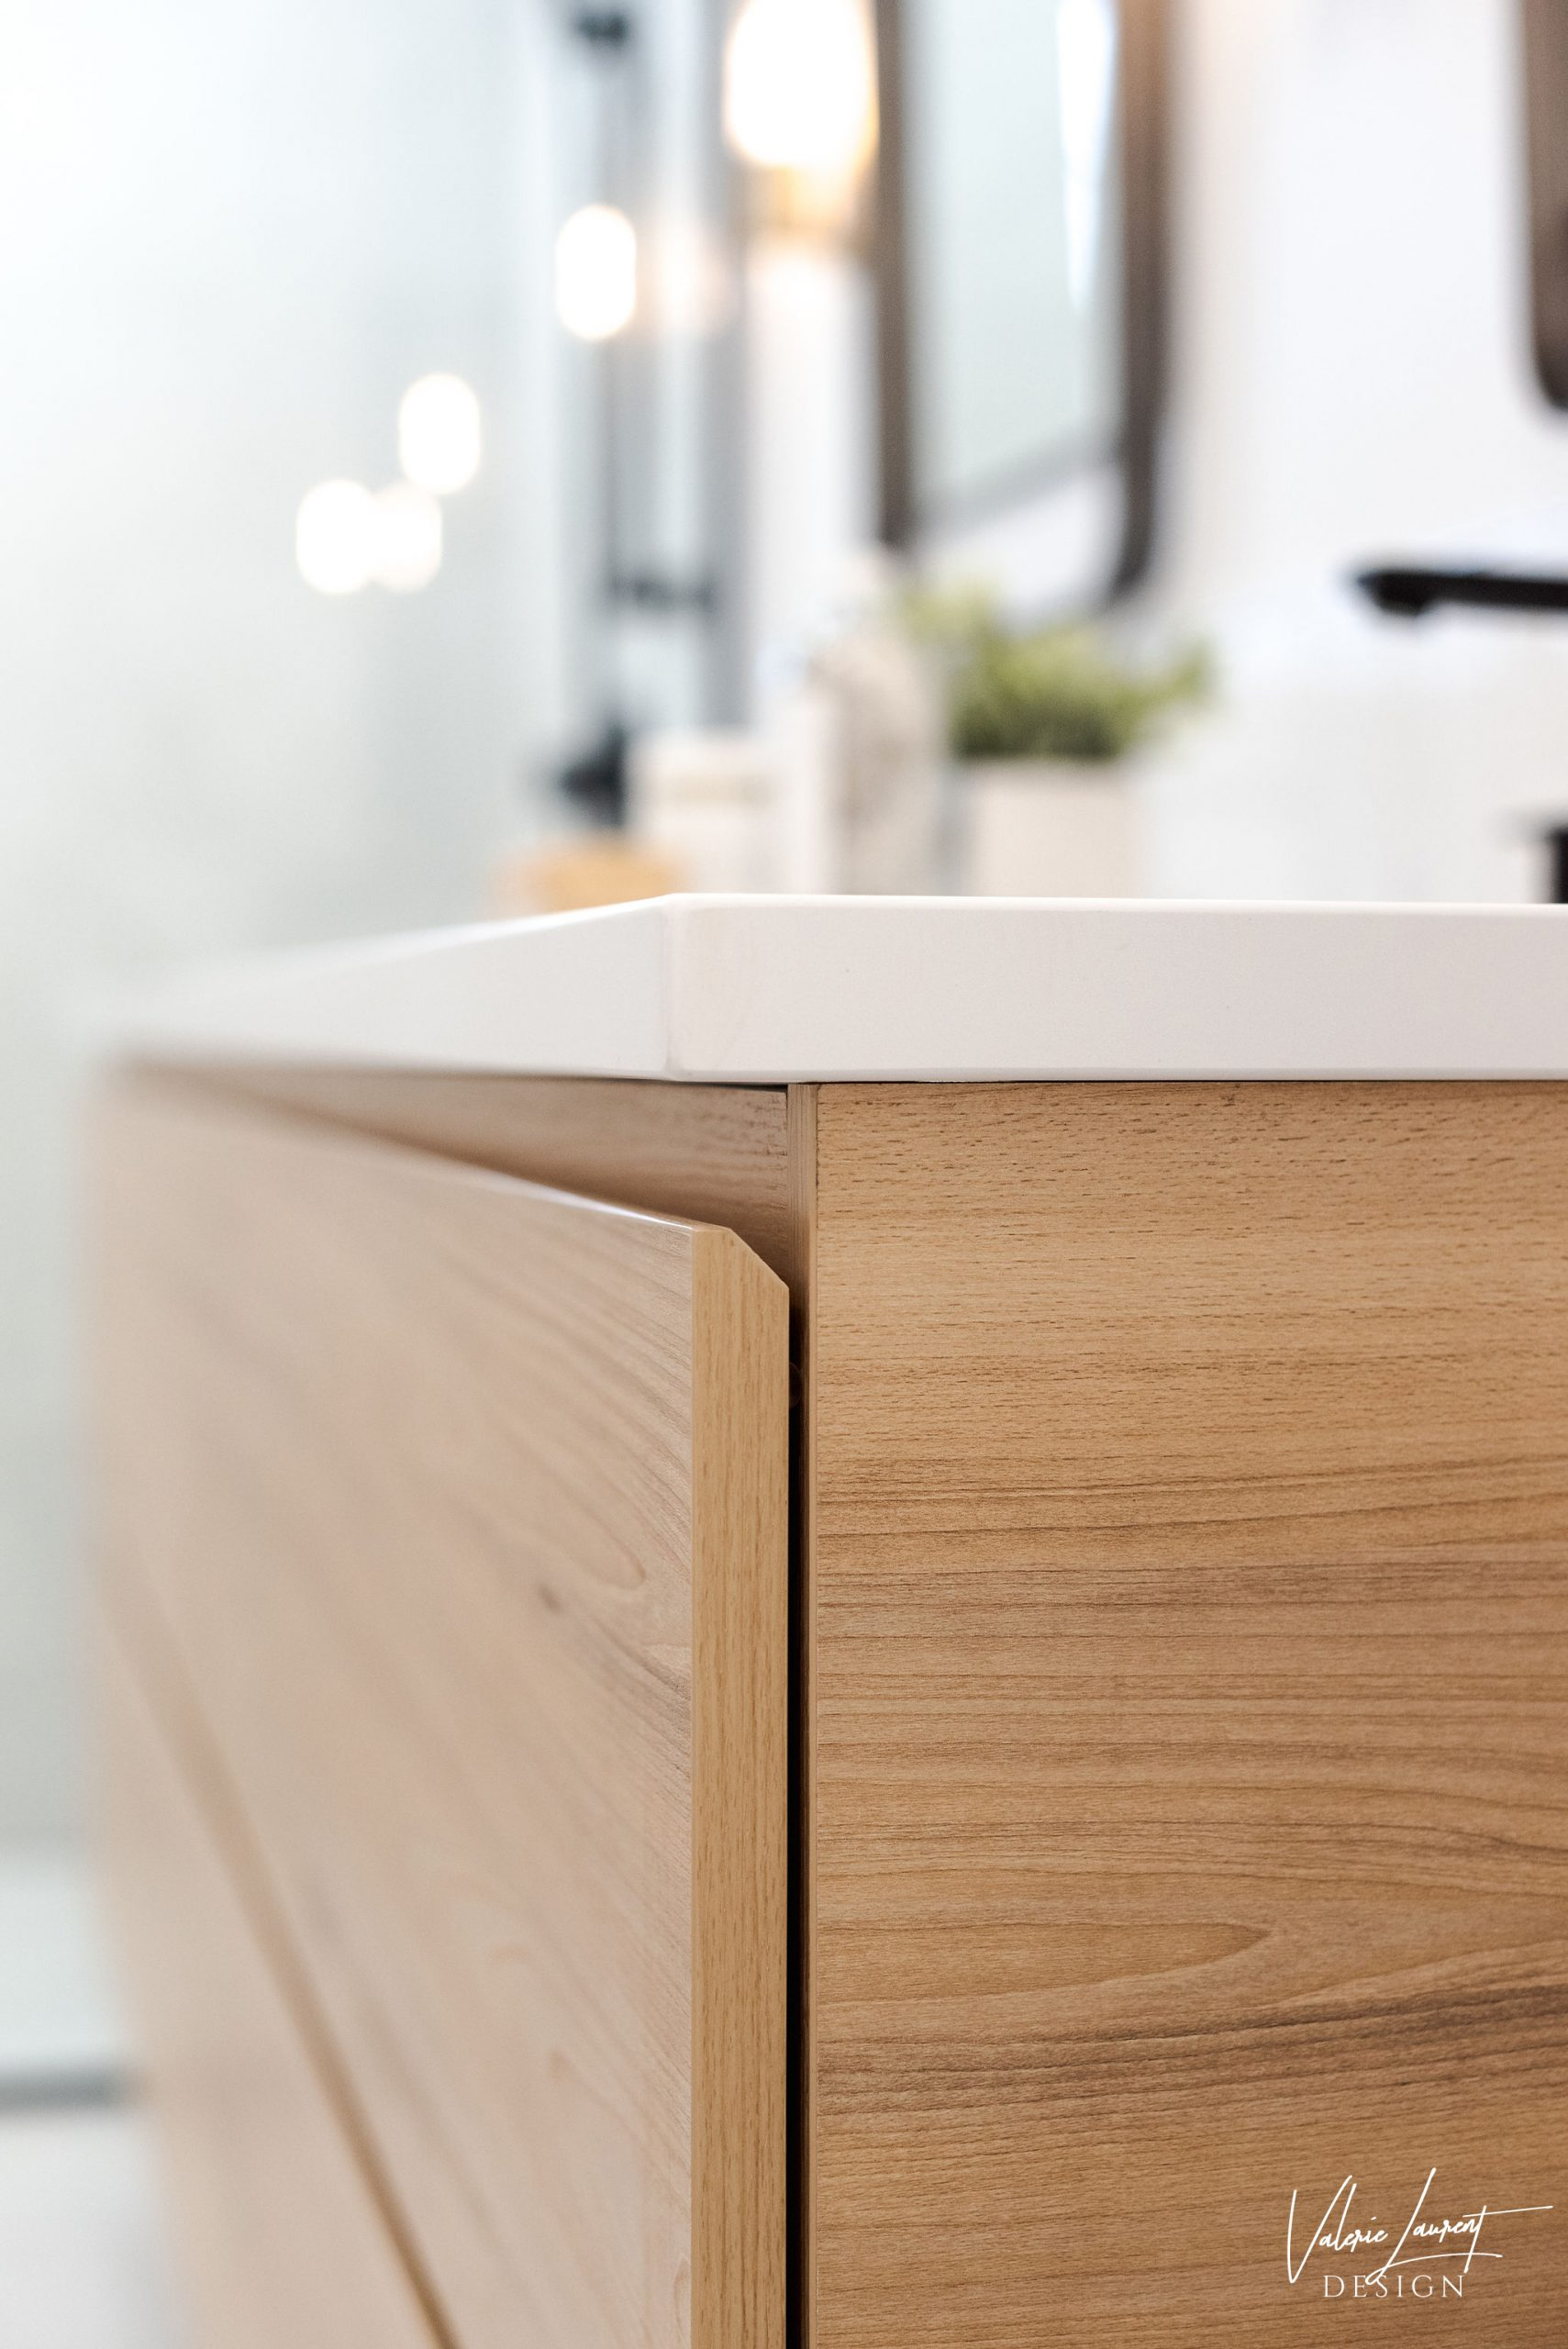 Valerie Laurent Design Furniture Detail Vanity Custom Wood Bois vanité sur mesure